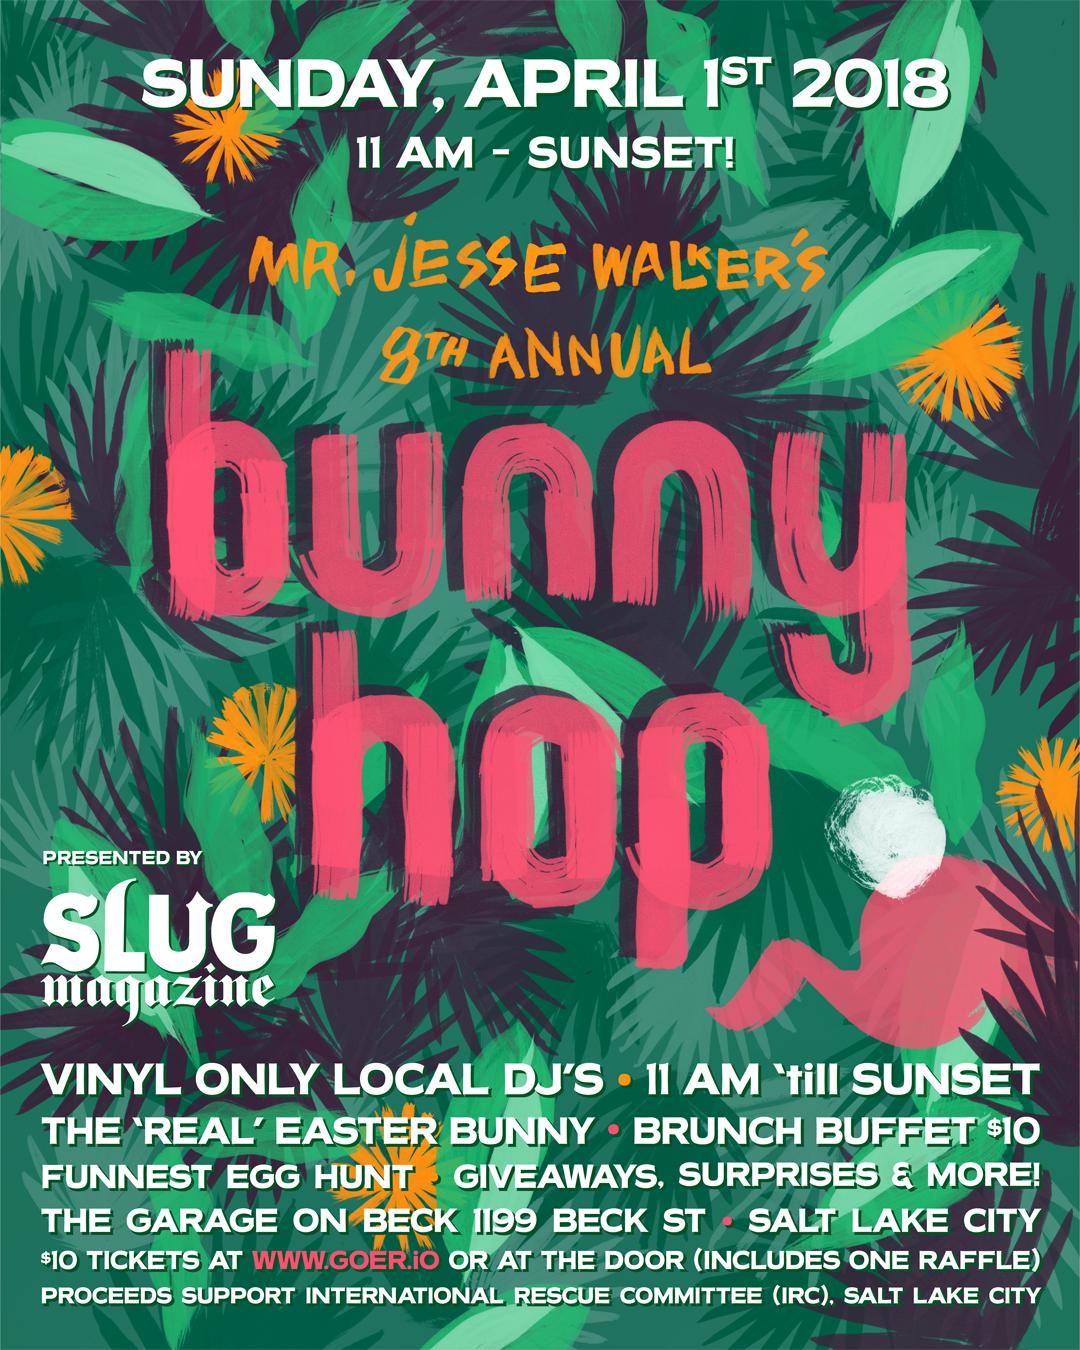 On Sunday, April 1st The Garage On Beck Street Will Host Mr. Jesse Walkeru0027s  8th Annual U0027Bunny Hop,u0027 Presented By SLUG Magazine.